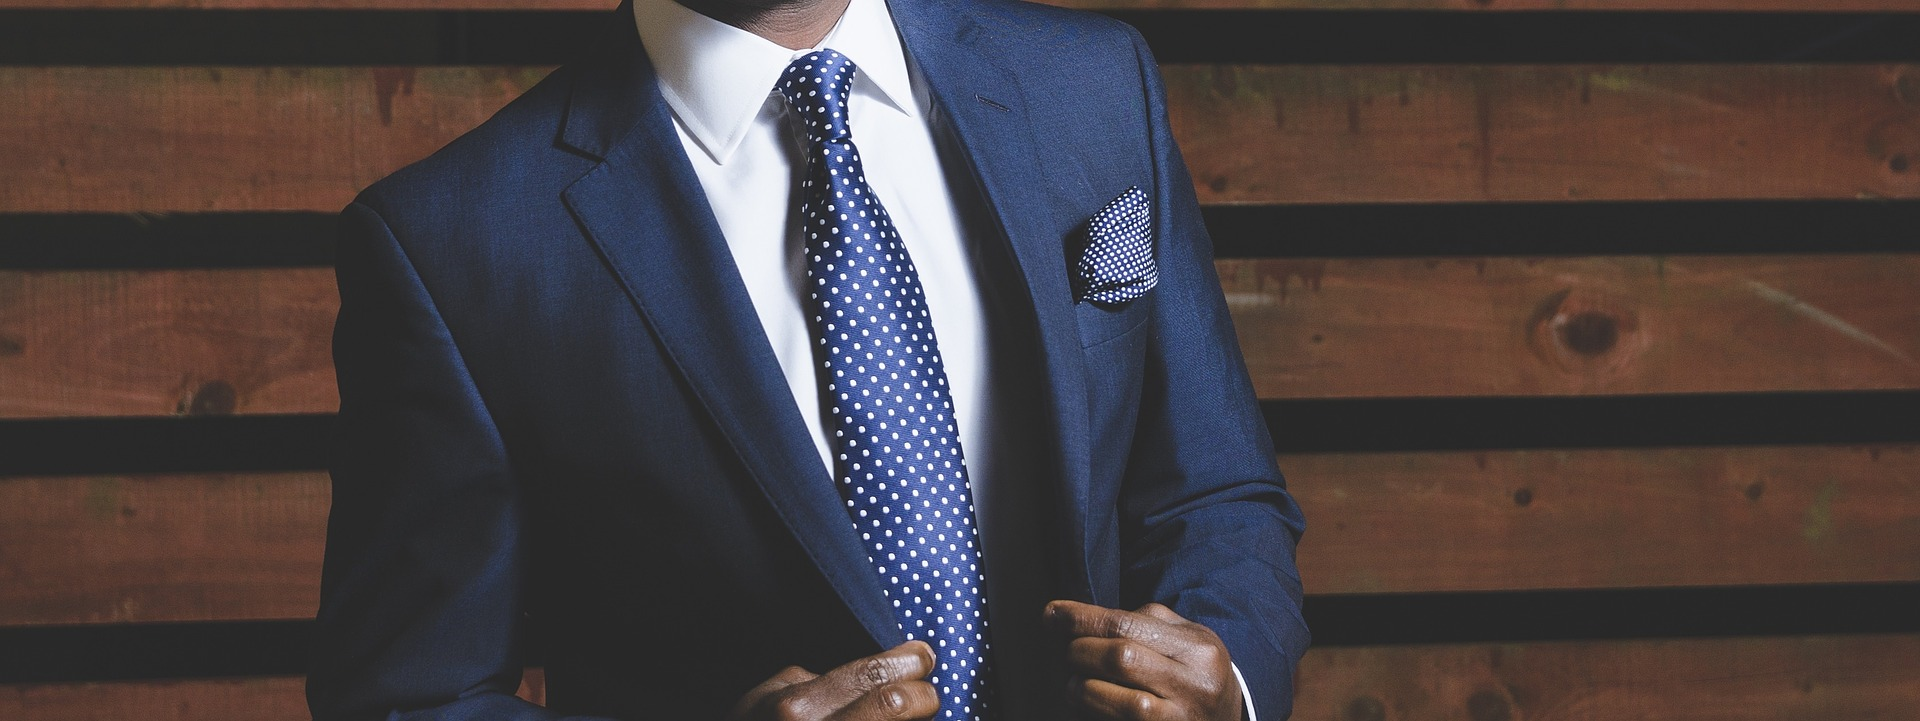 Comment porter le costume cravate